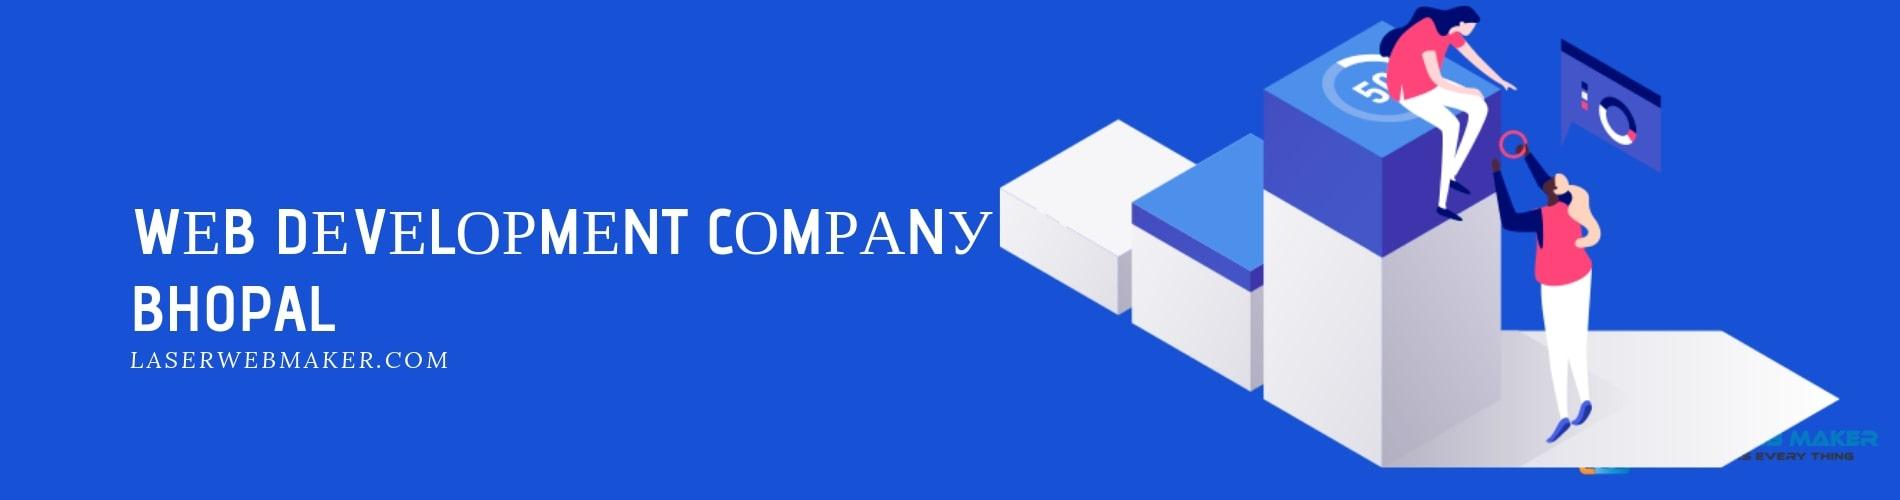 web development company in bhopal